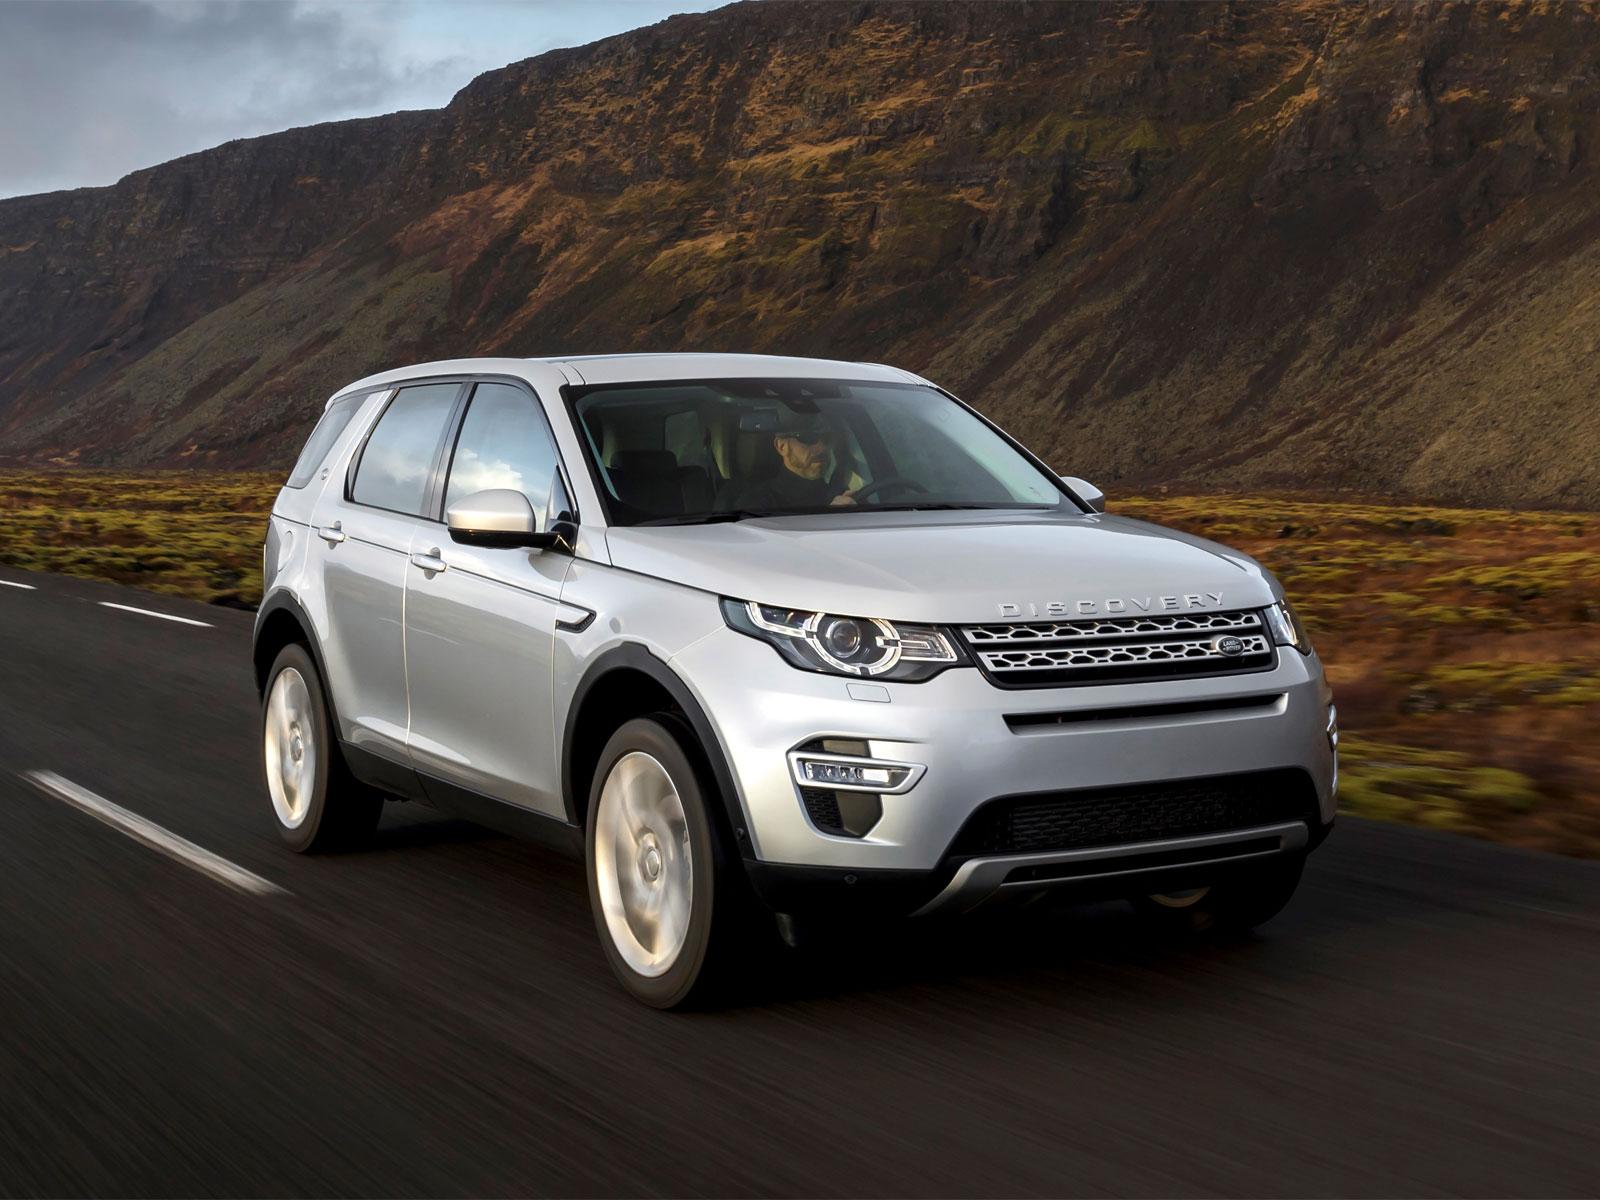 2015 land rover discovery sport autoguru for Discovery katalog